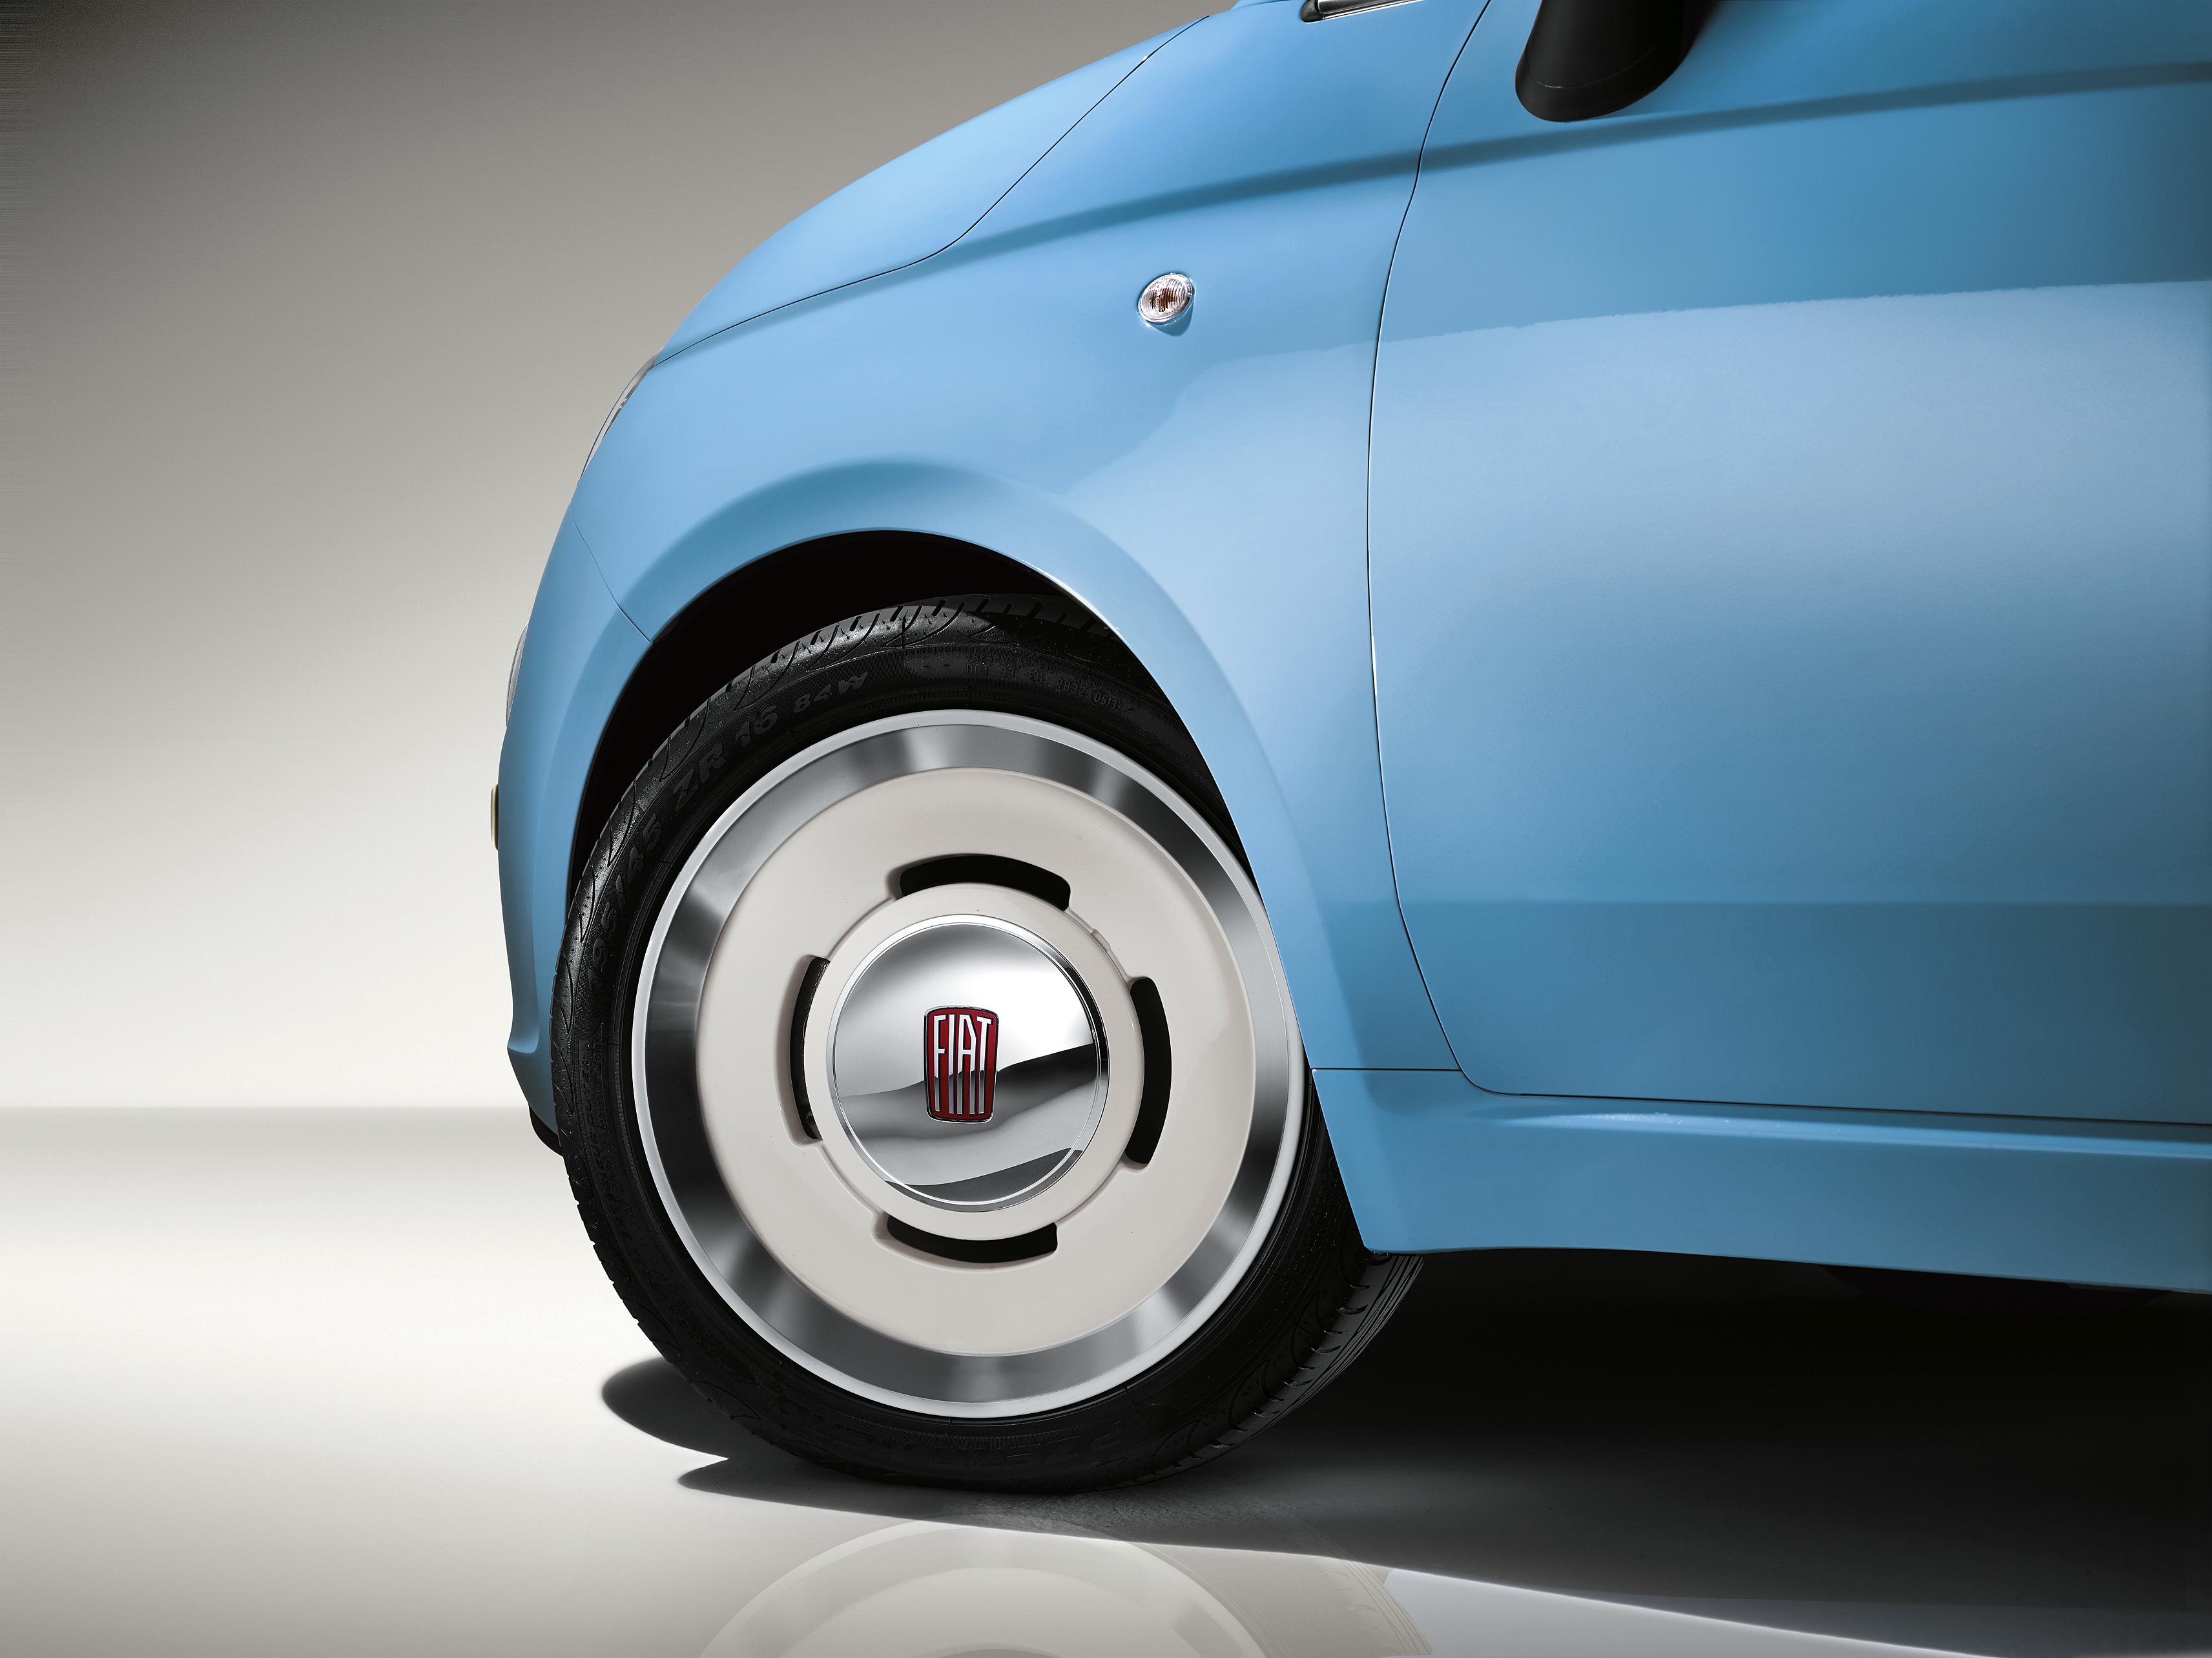 Fiat 500 Vintage 57 To Debut At 2015 Geneva Motor Show